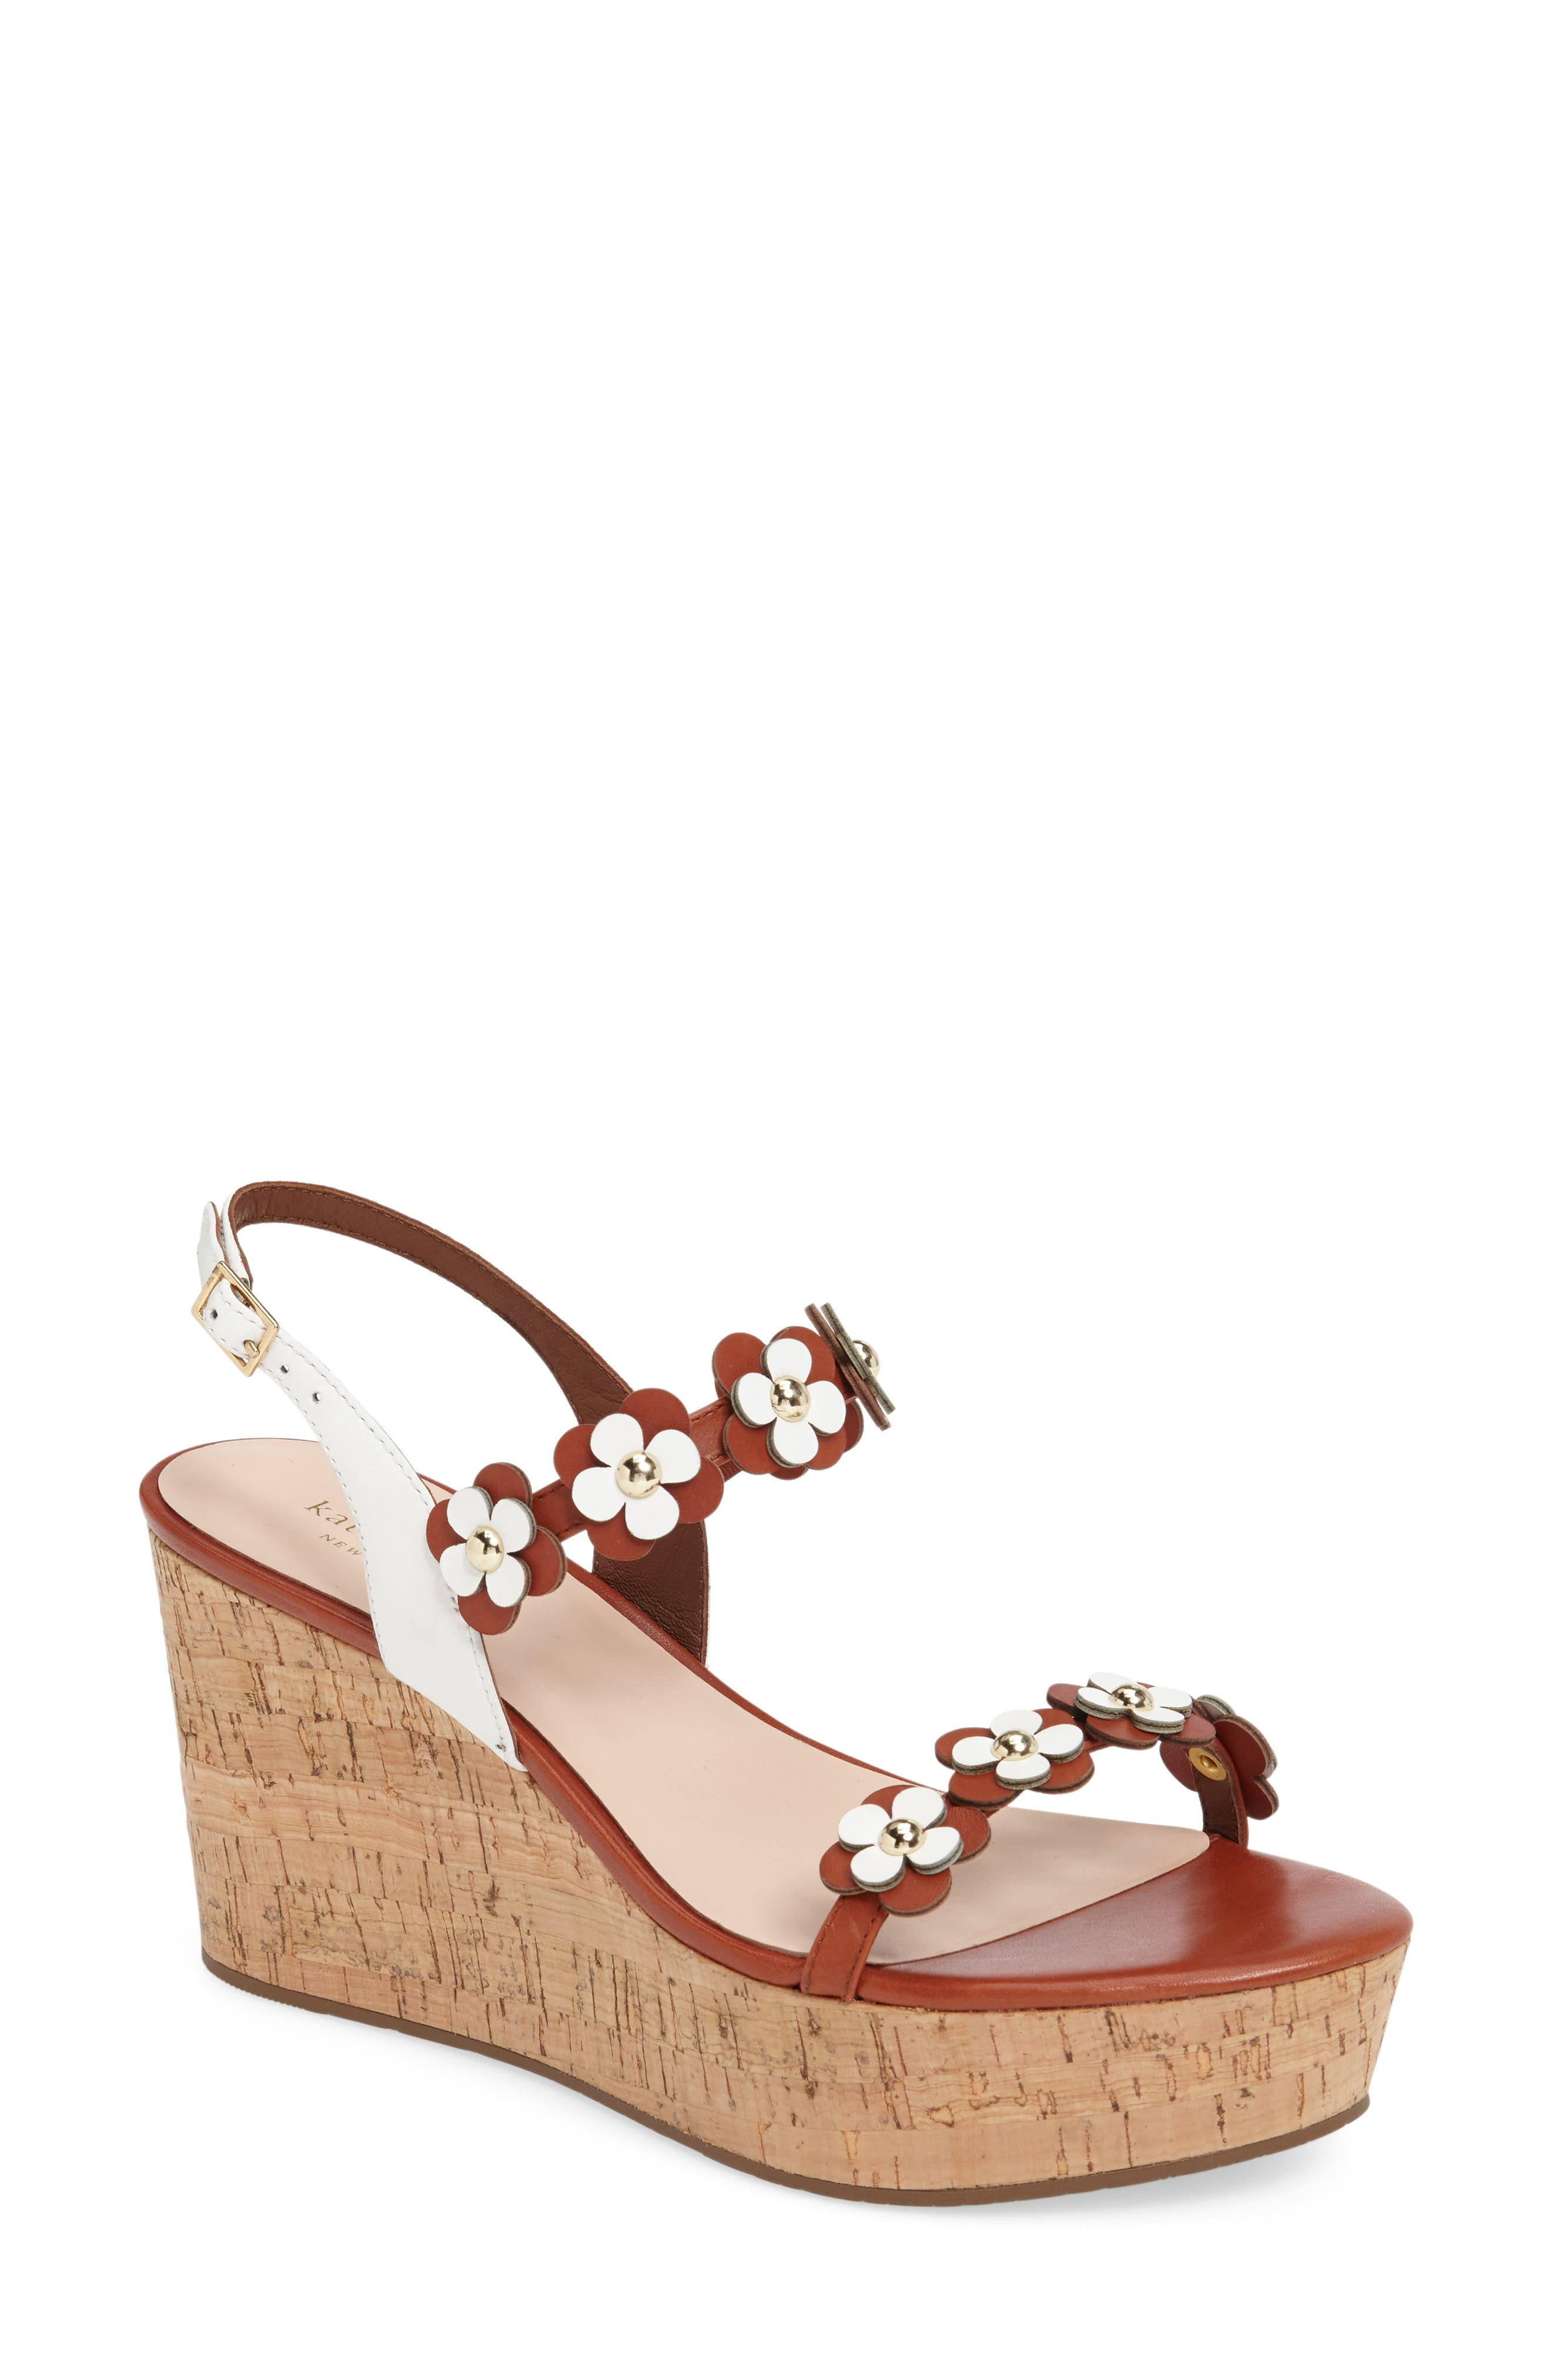 KATE SPADE NEW YORK, tisdale platform wedge sandal, Main thumbnail 1, color, 200